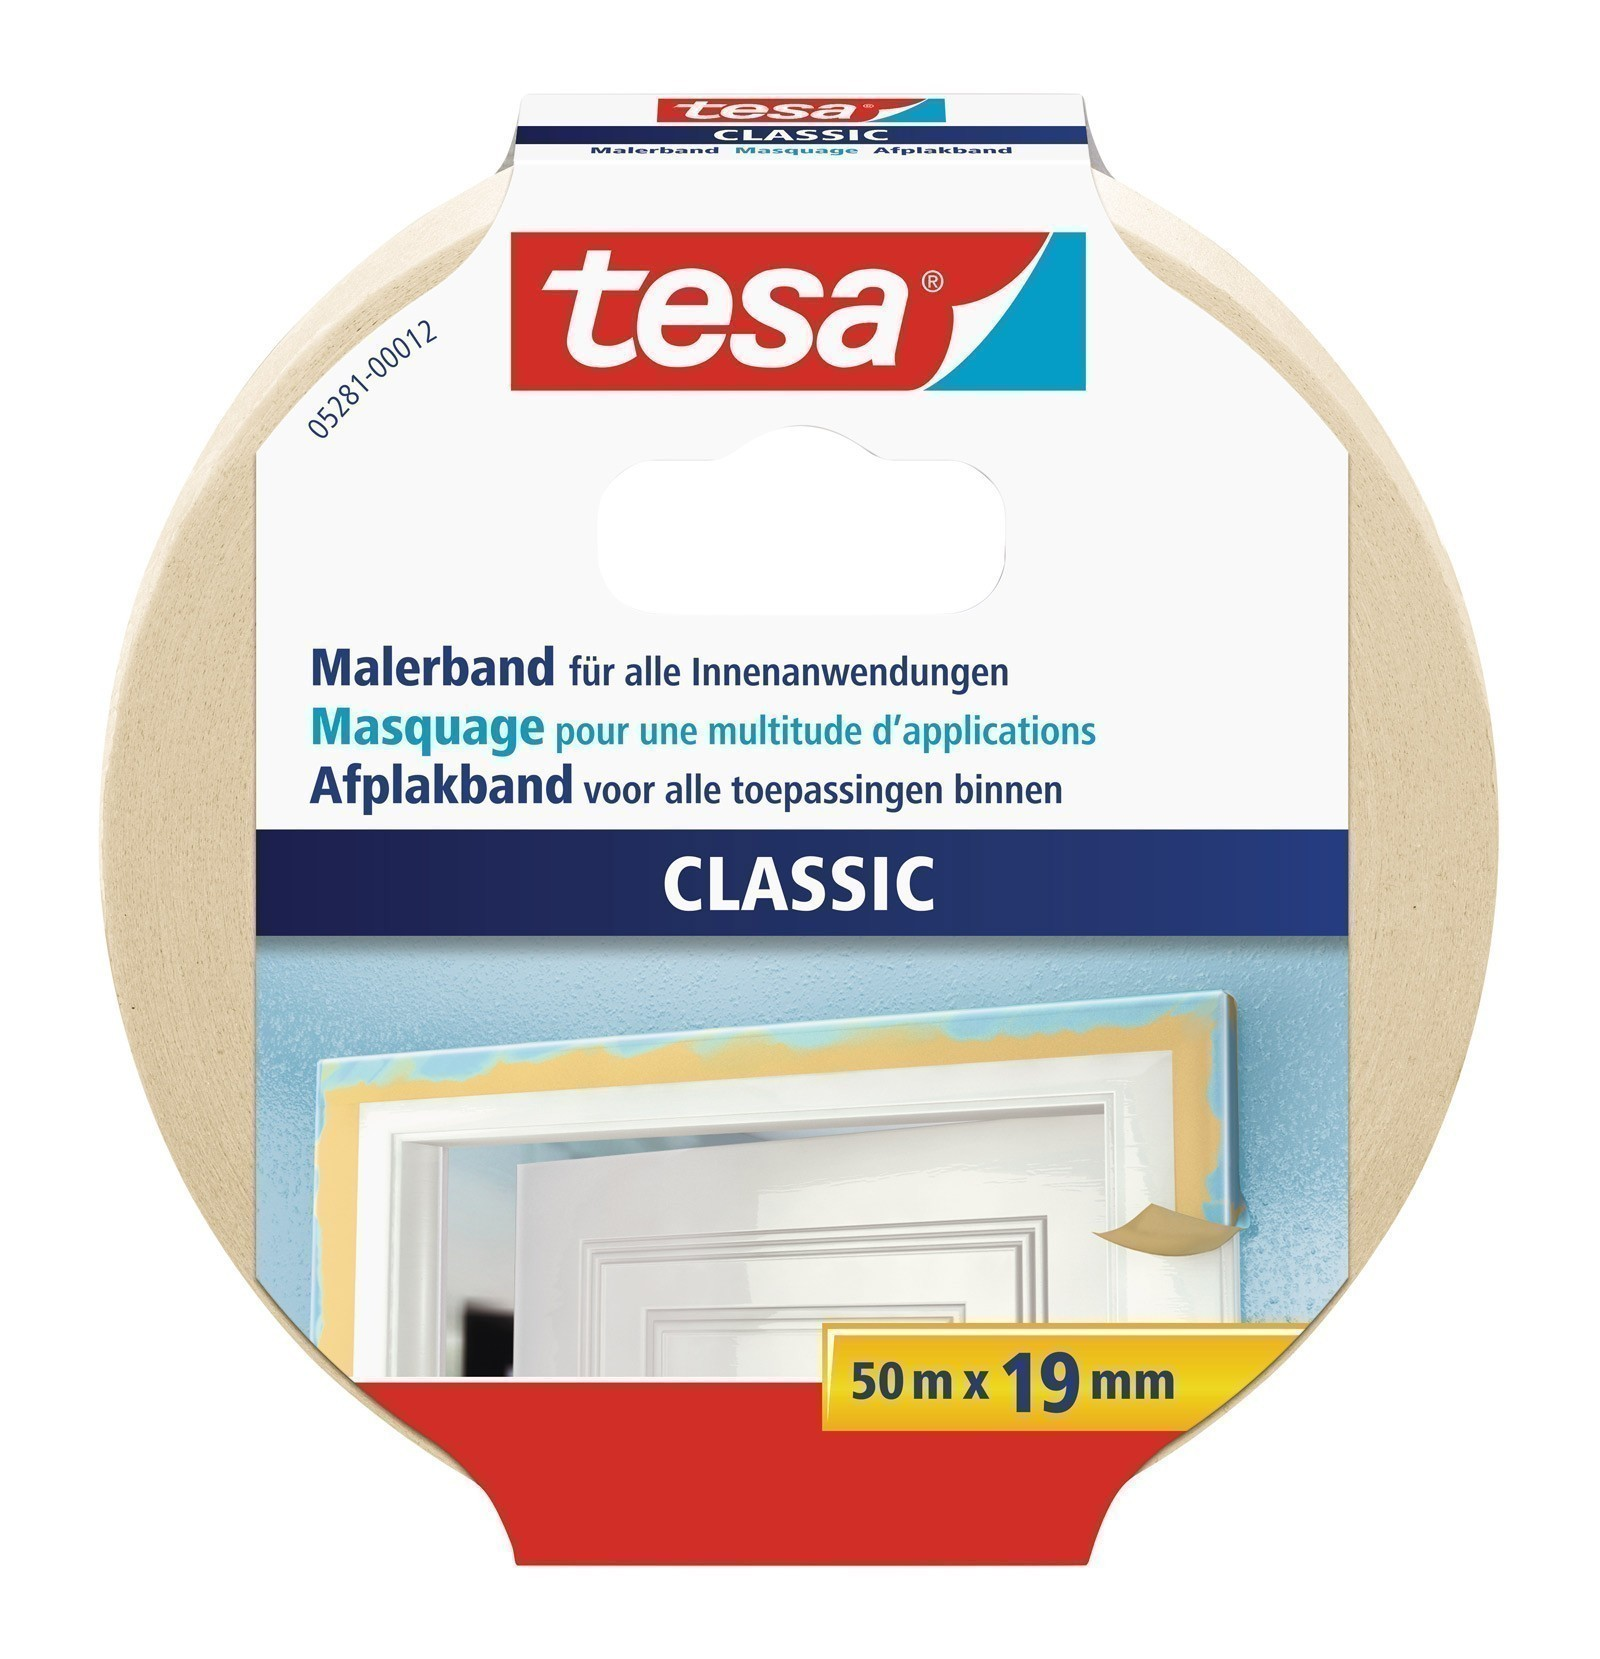 tesa® Malerkrepp Premium Classic 50 m x 30 mm Bild 1